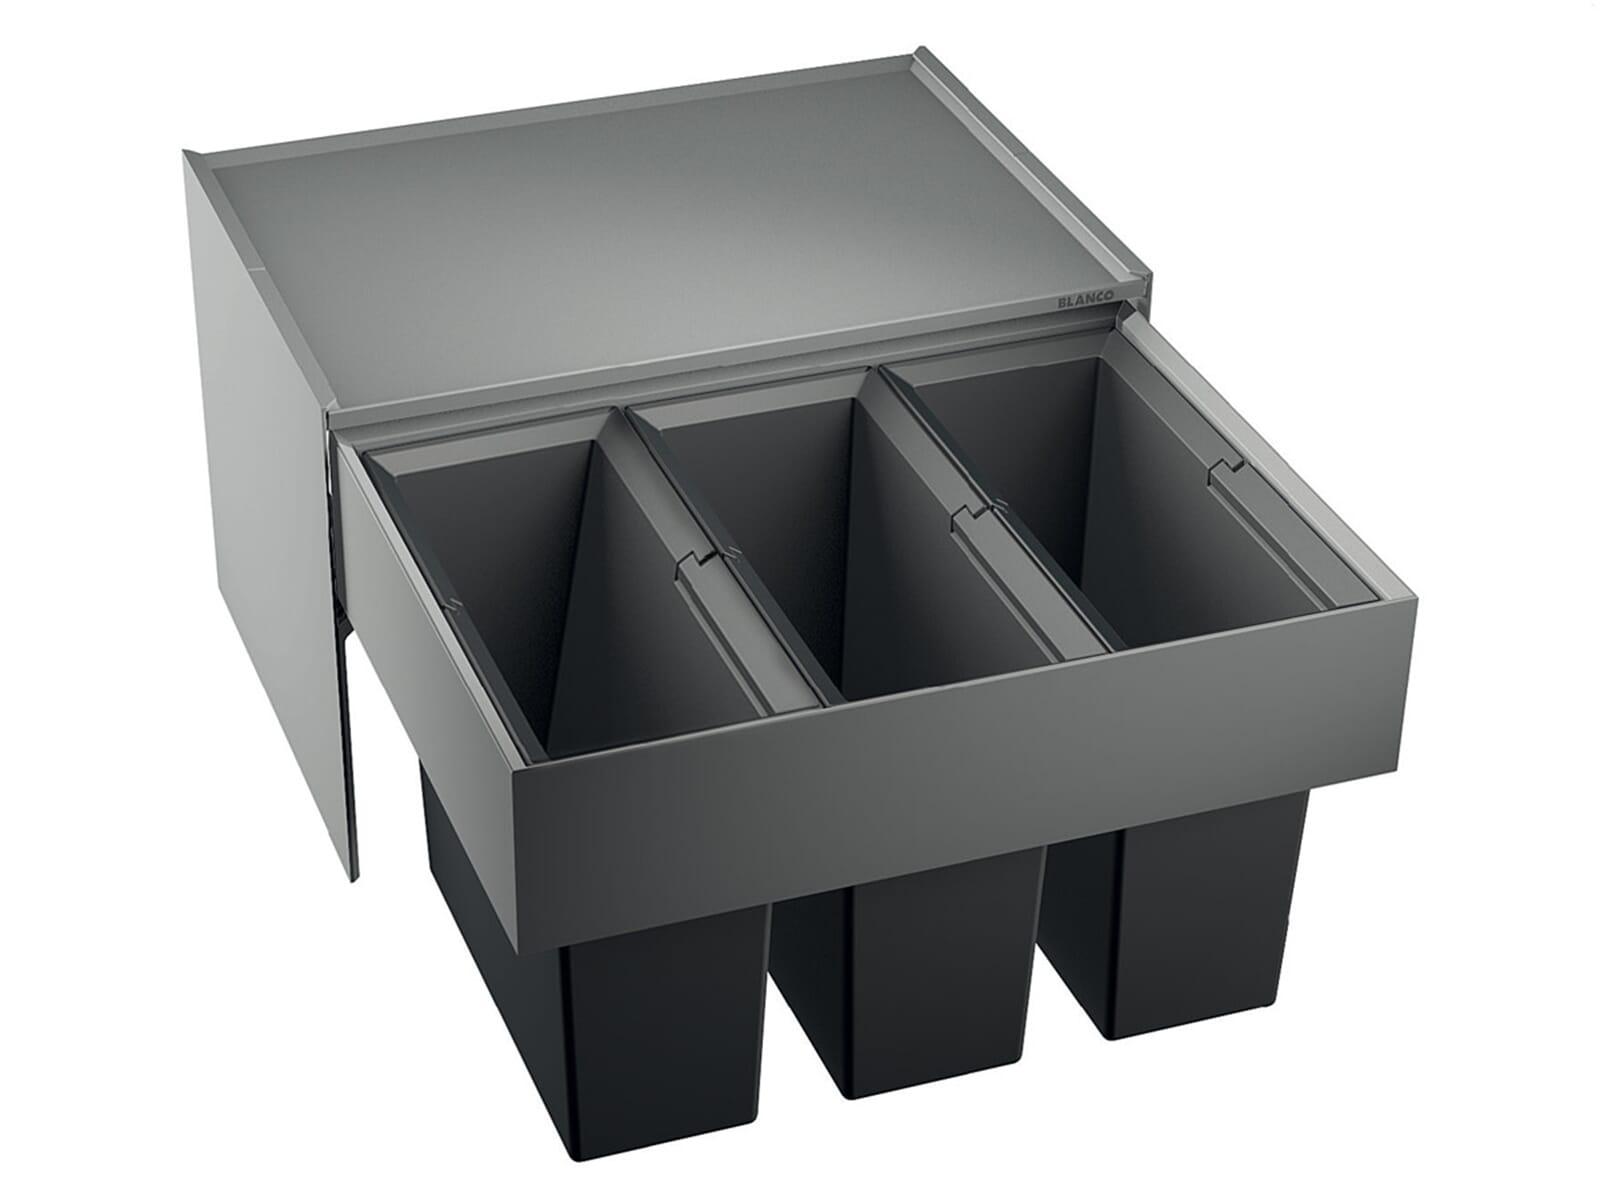 blanco select 60 3 einbau abfallsammler. Black Bedroom Furniture Sets. Home Design Ideas